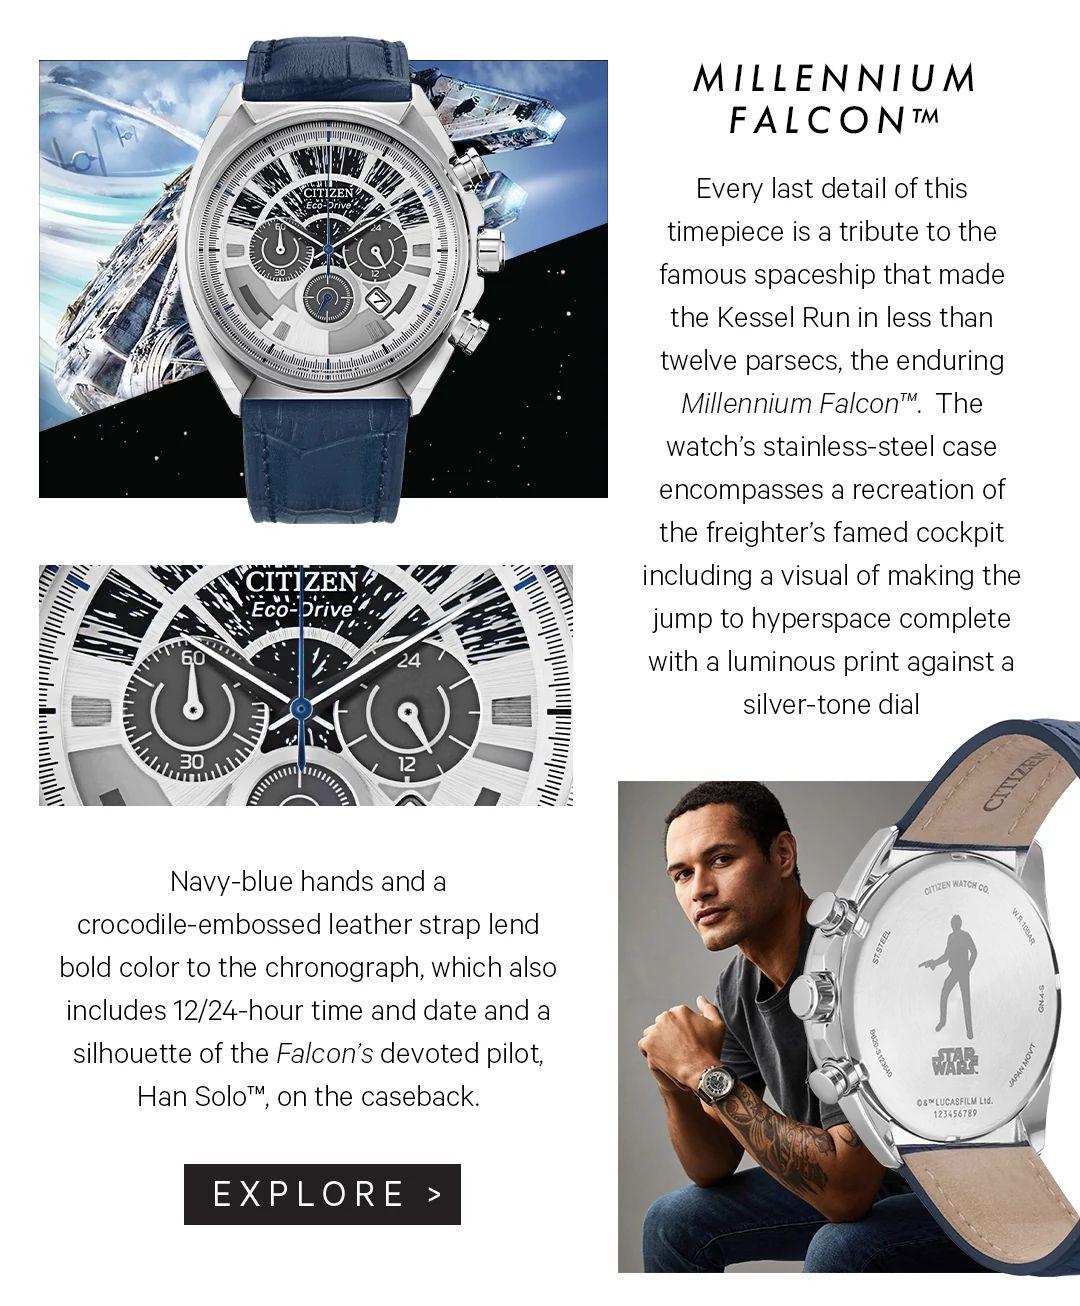 Millennium falcon Mobile